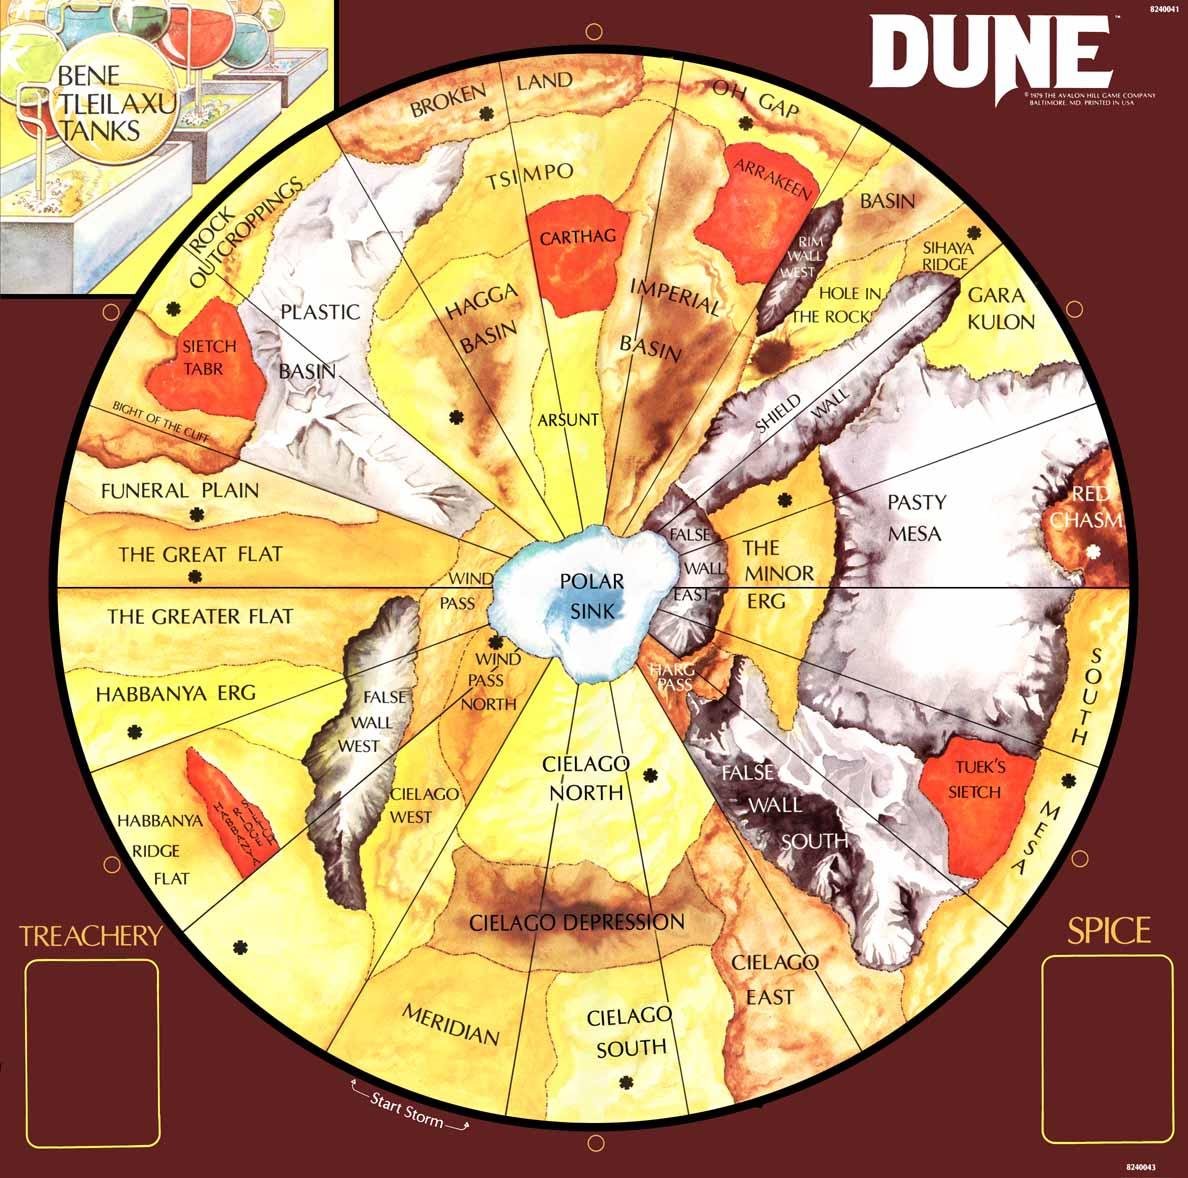 dune planet map - photo #3